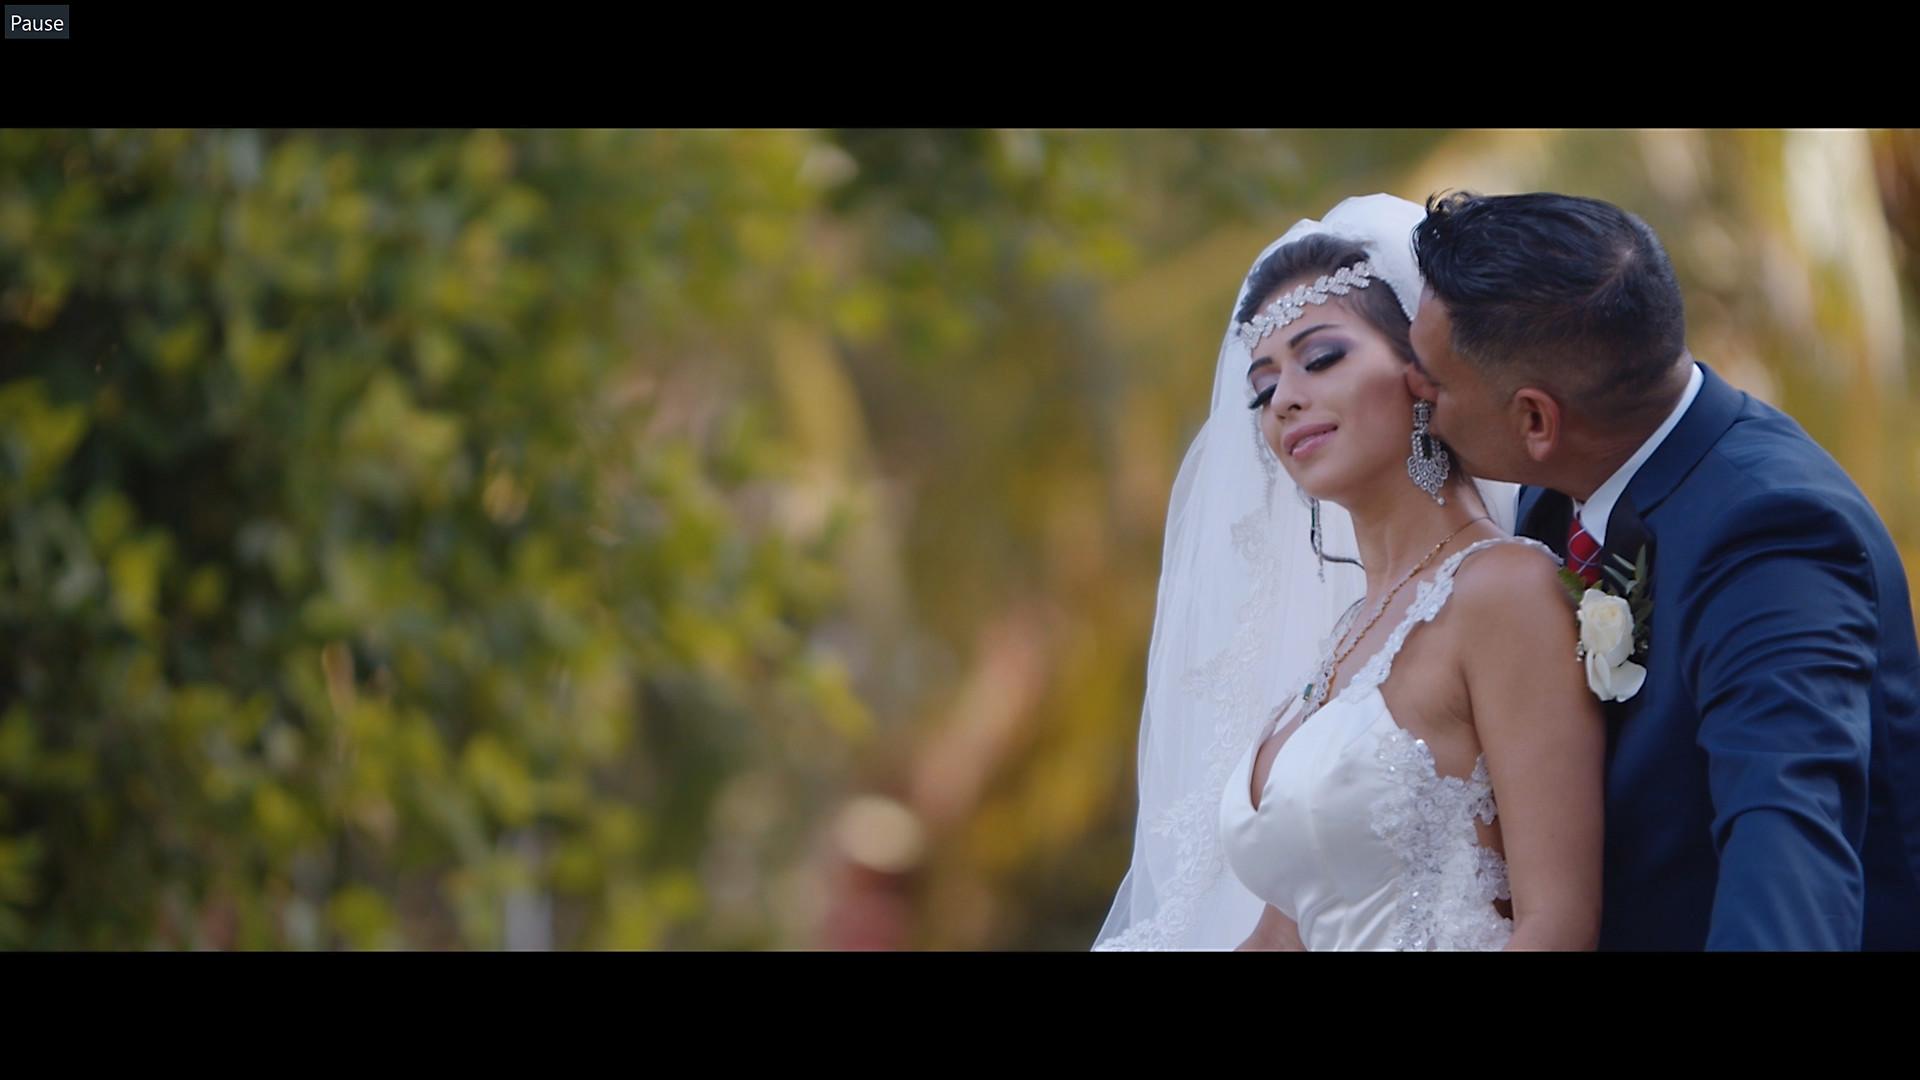 Fatima & Gil - Highlights.mp4